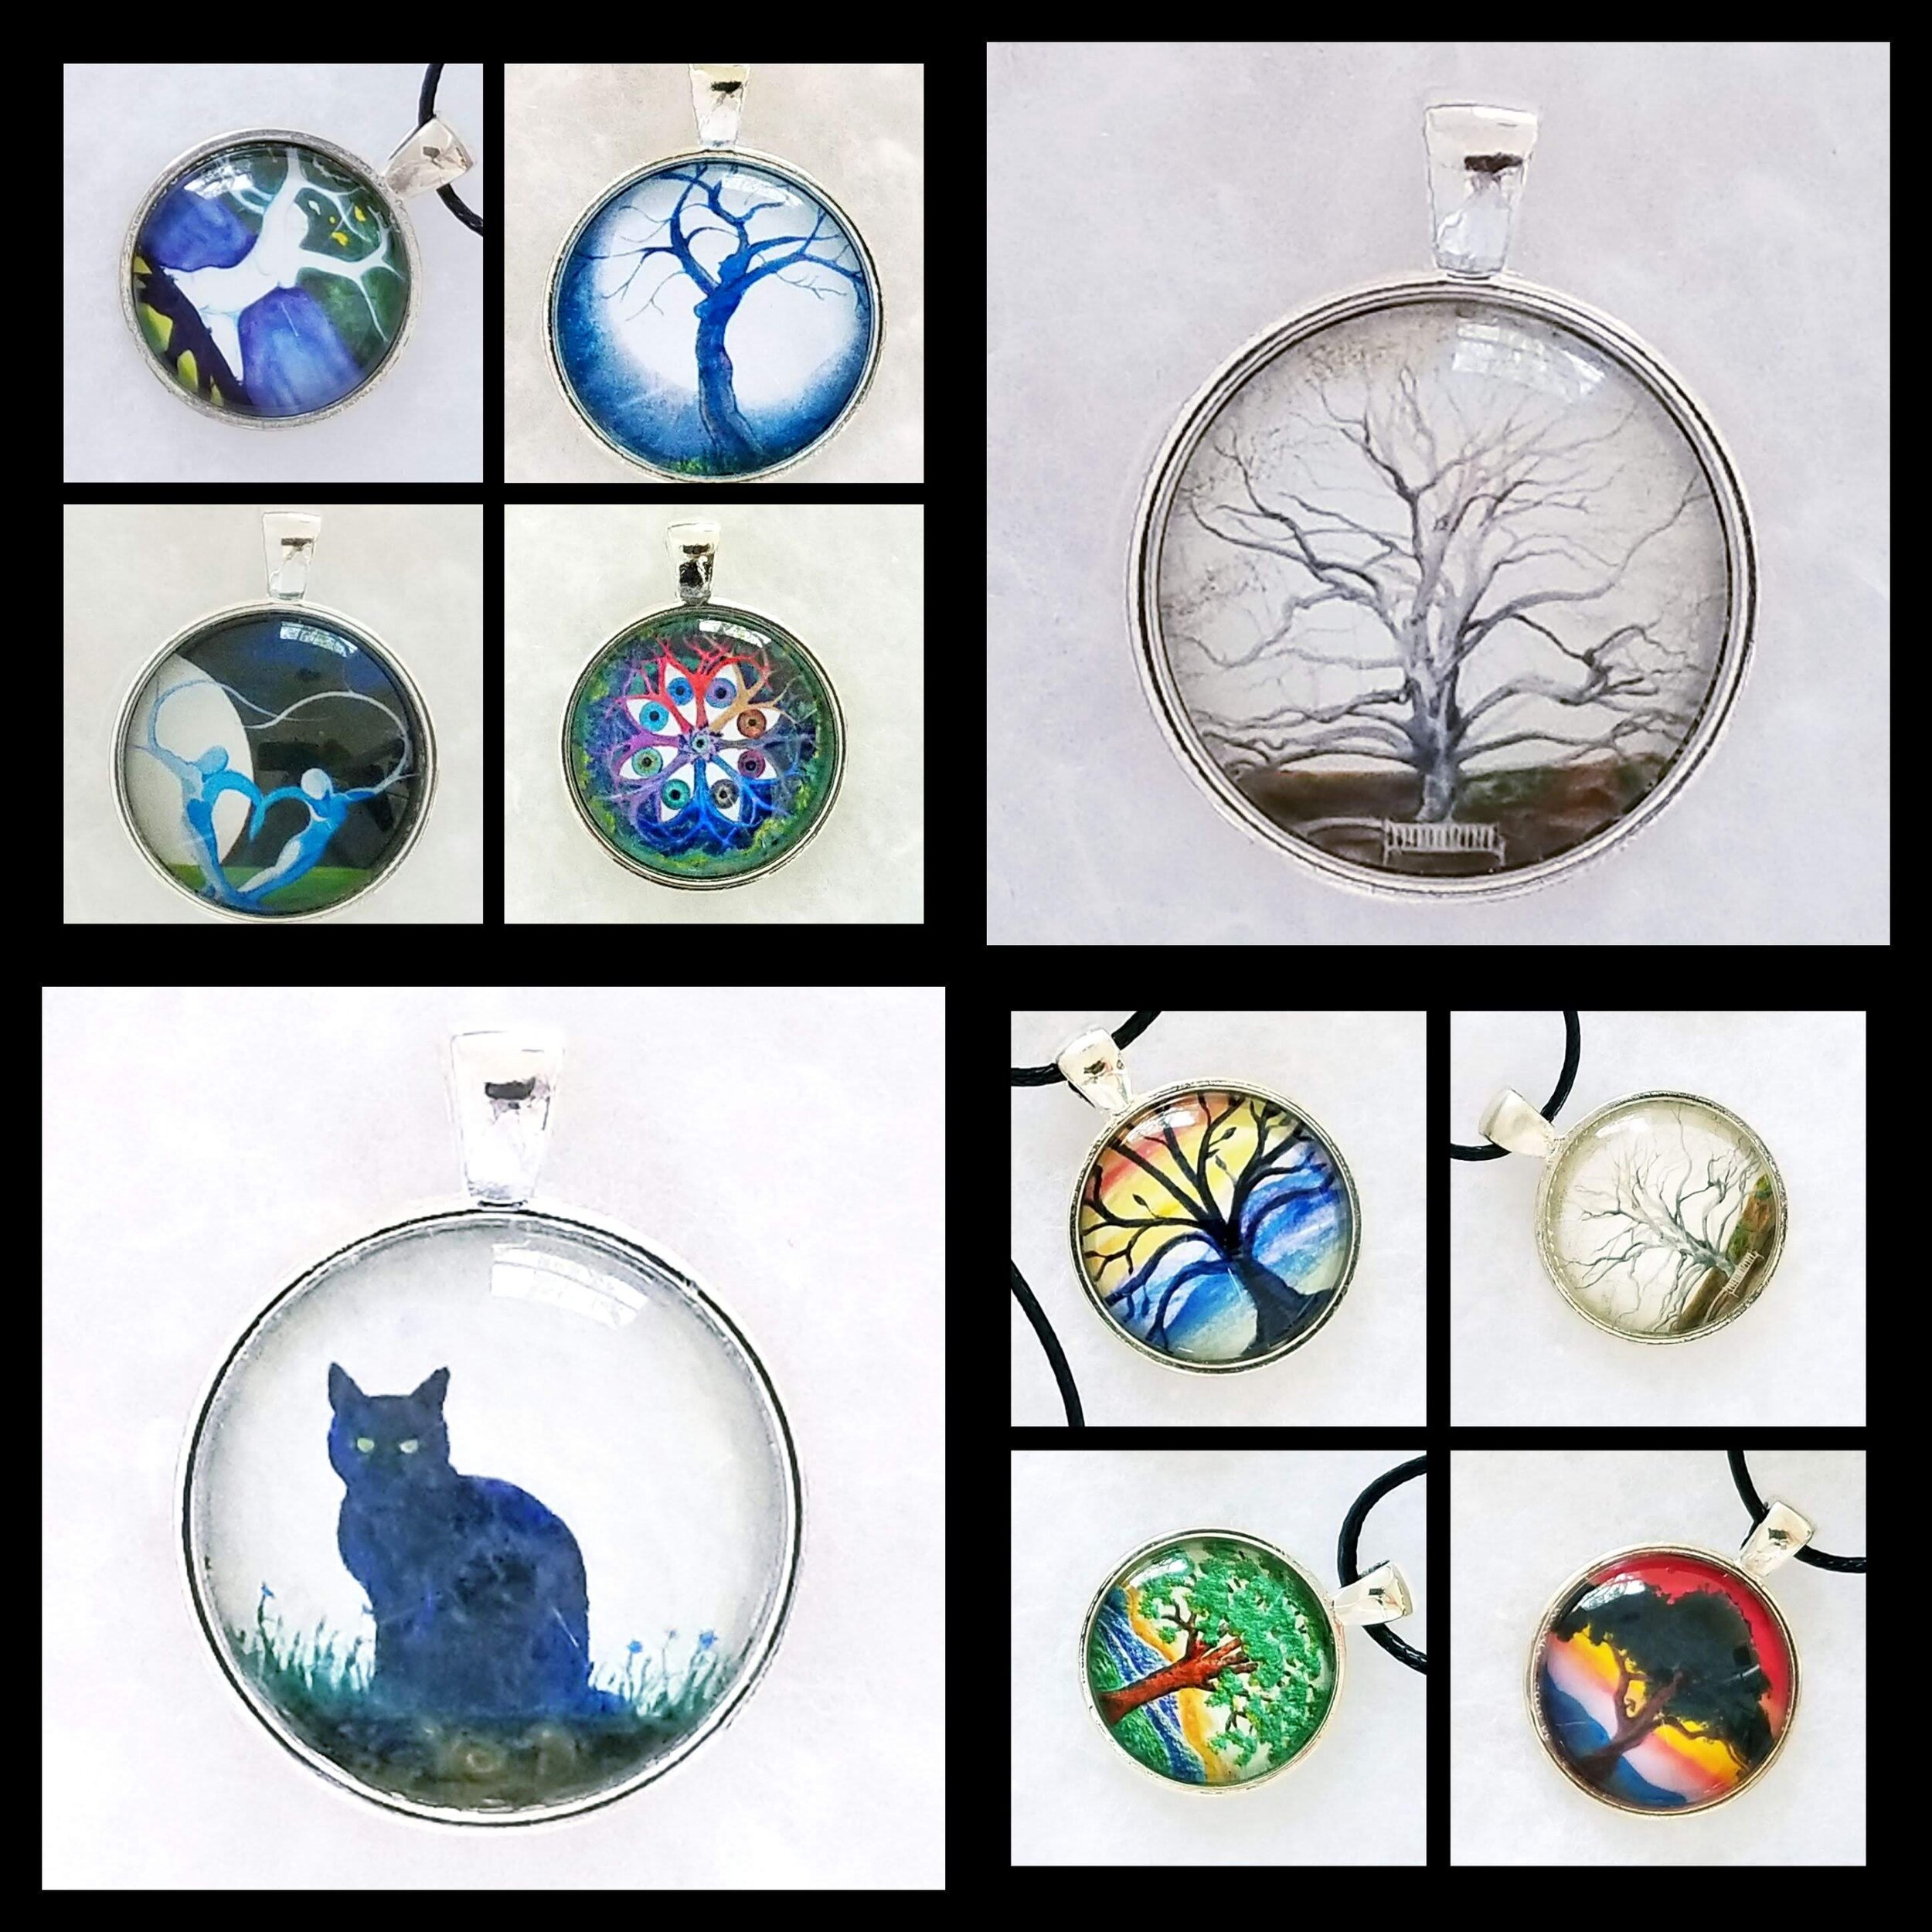 Bilyue_Flame_bezel pendants.jpg